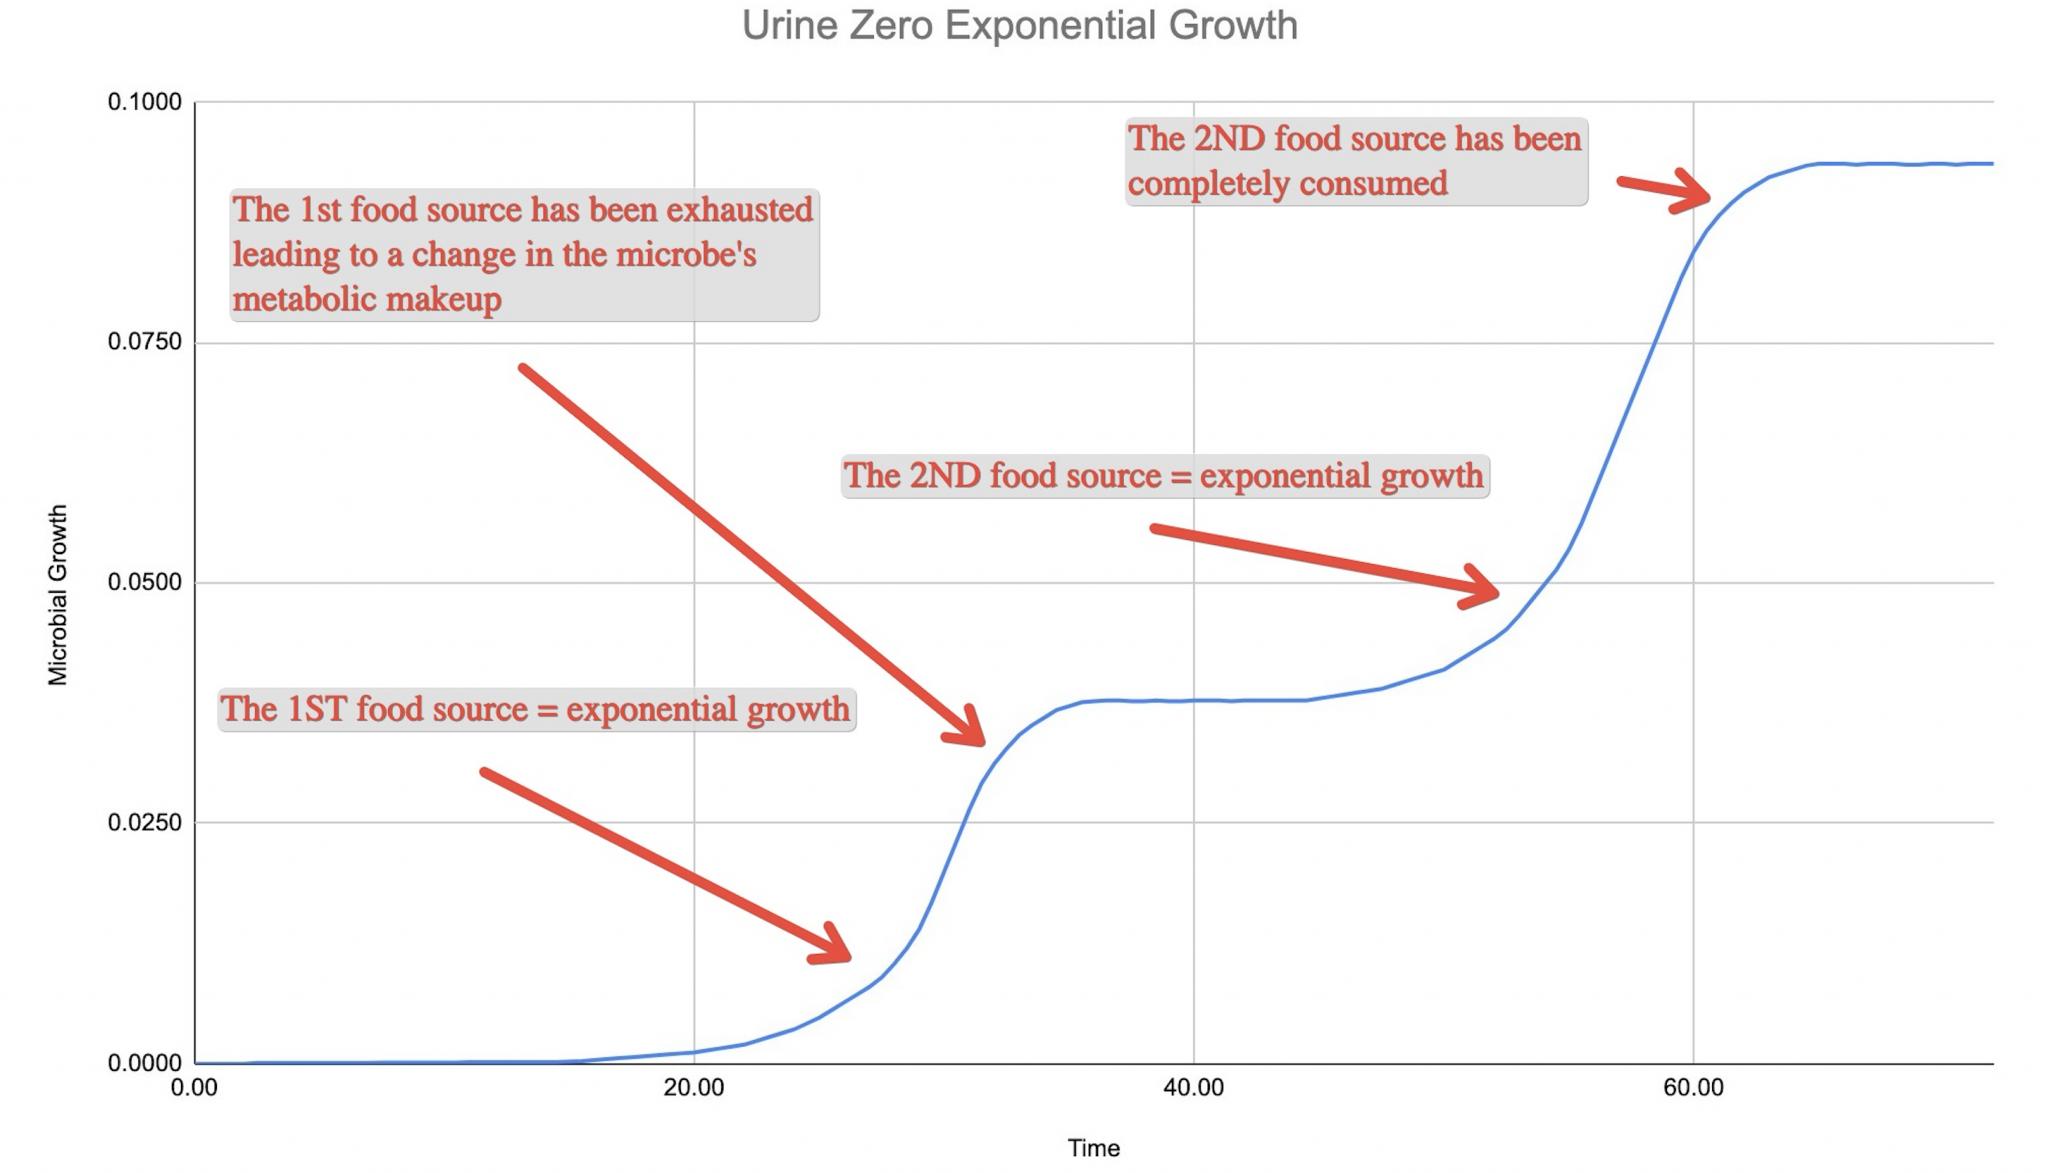 Urine Zero Exponential Growth